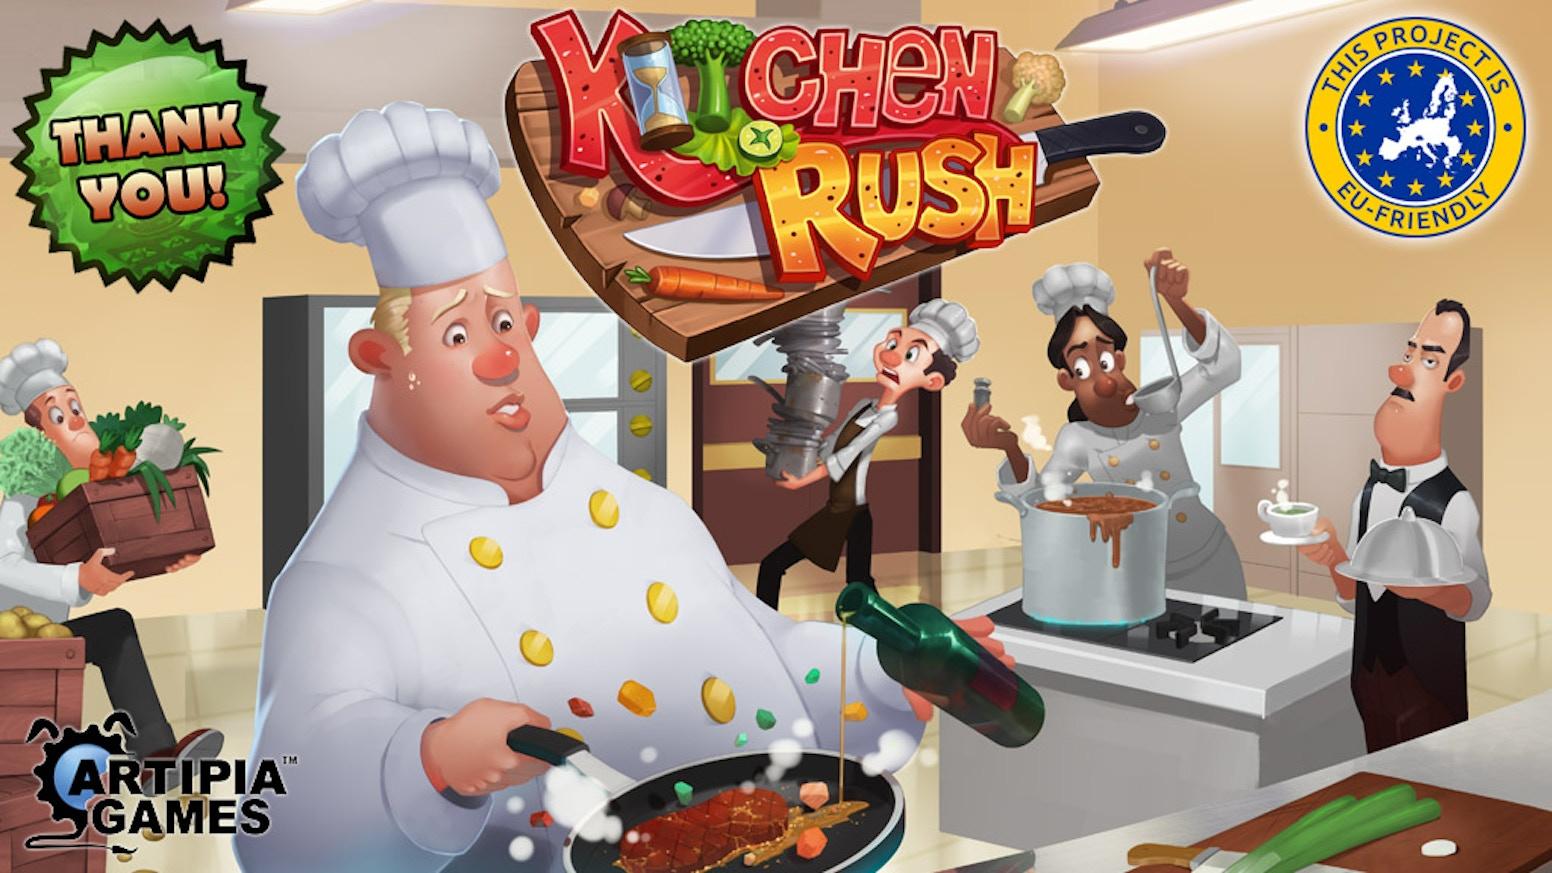 Kitchen rush by artipia games kickstarter for Kitchen set environment